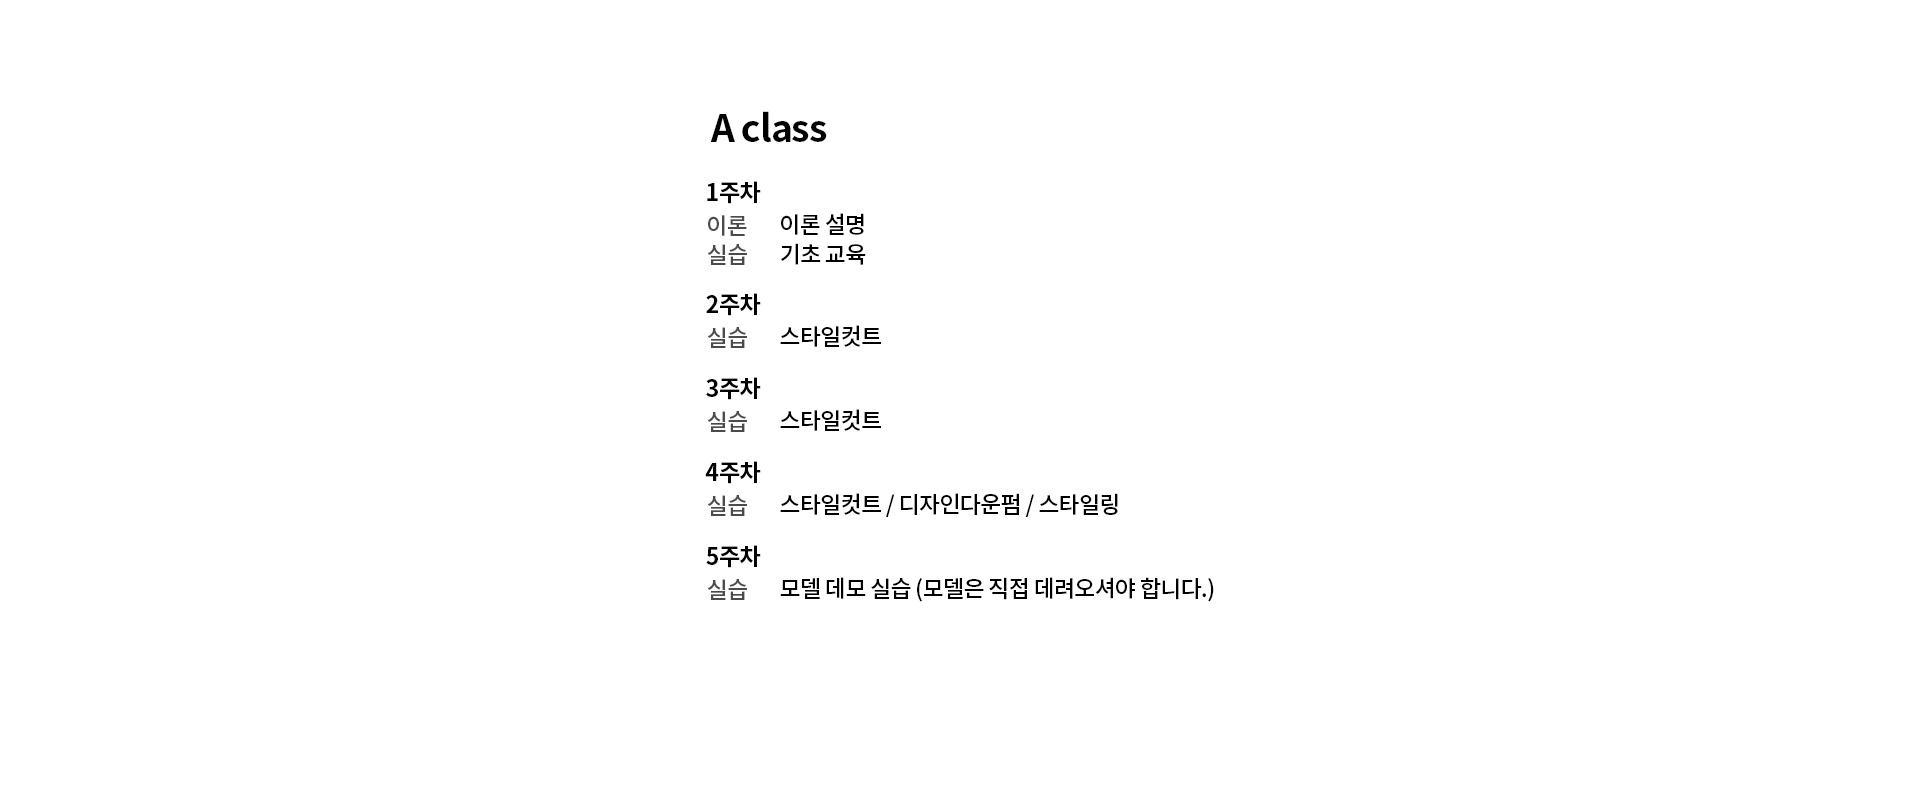 class 1주차 2주차 3주차 4주차 5주차